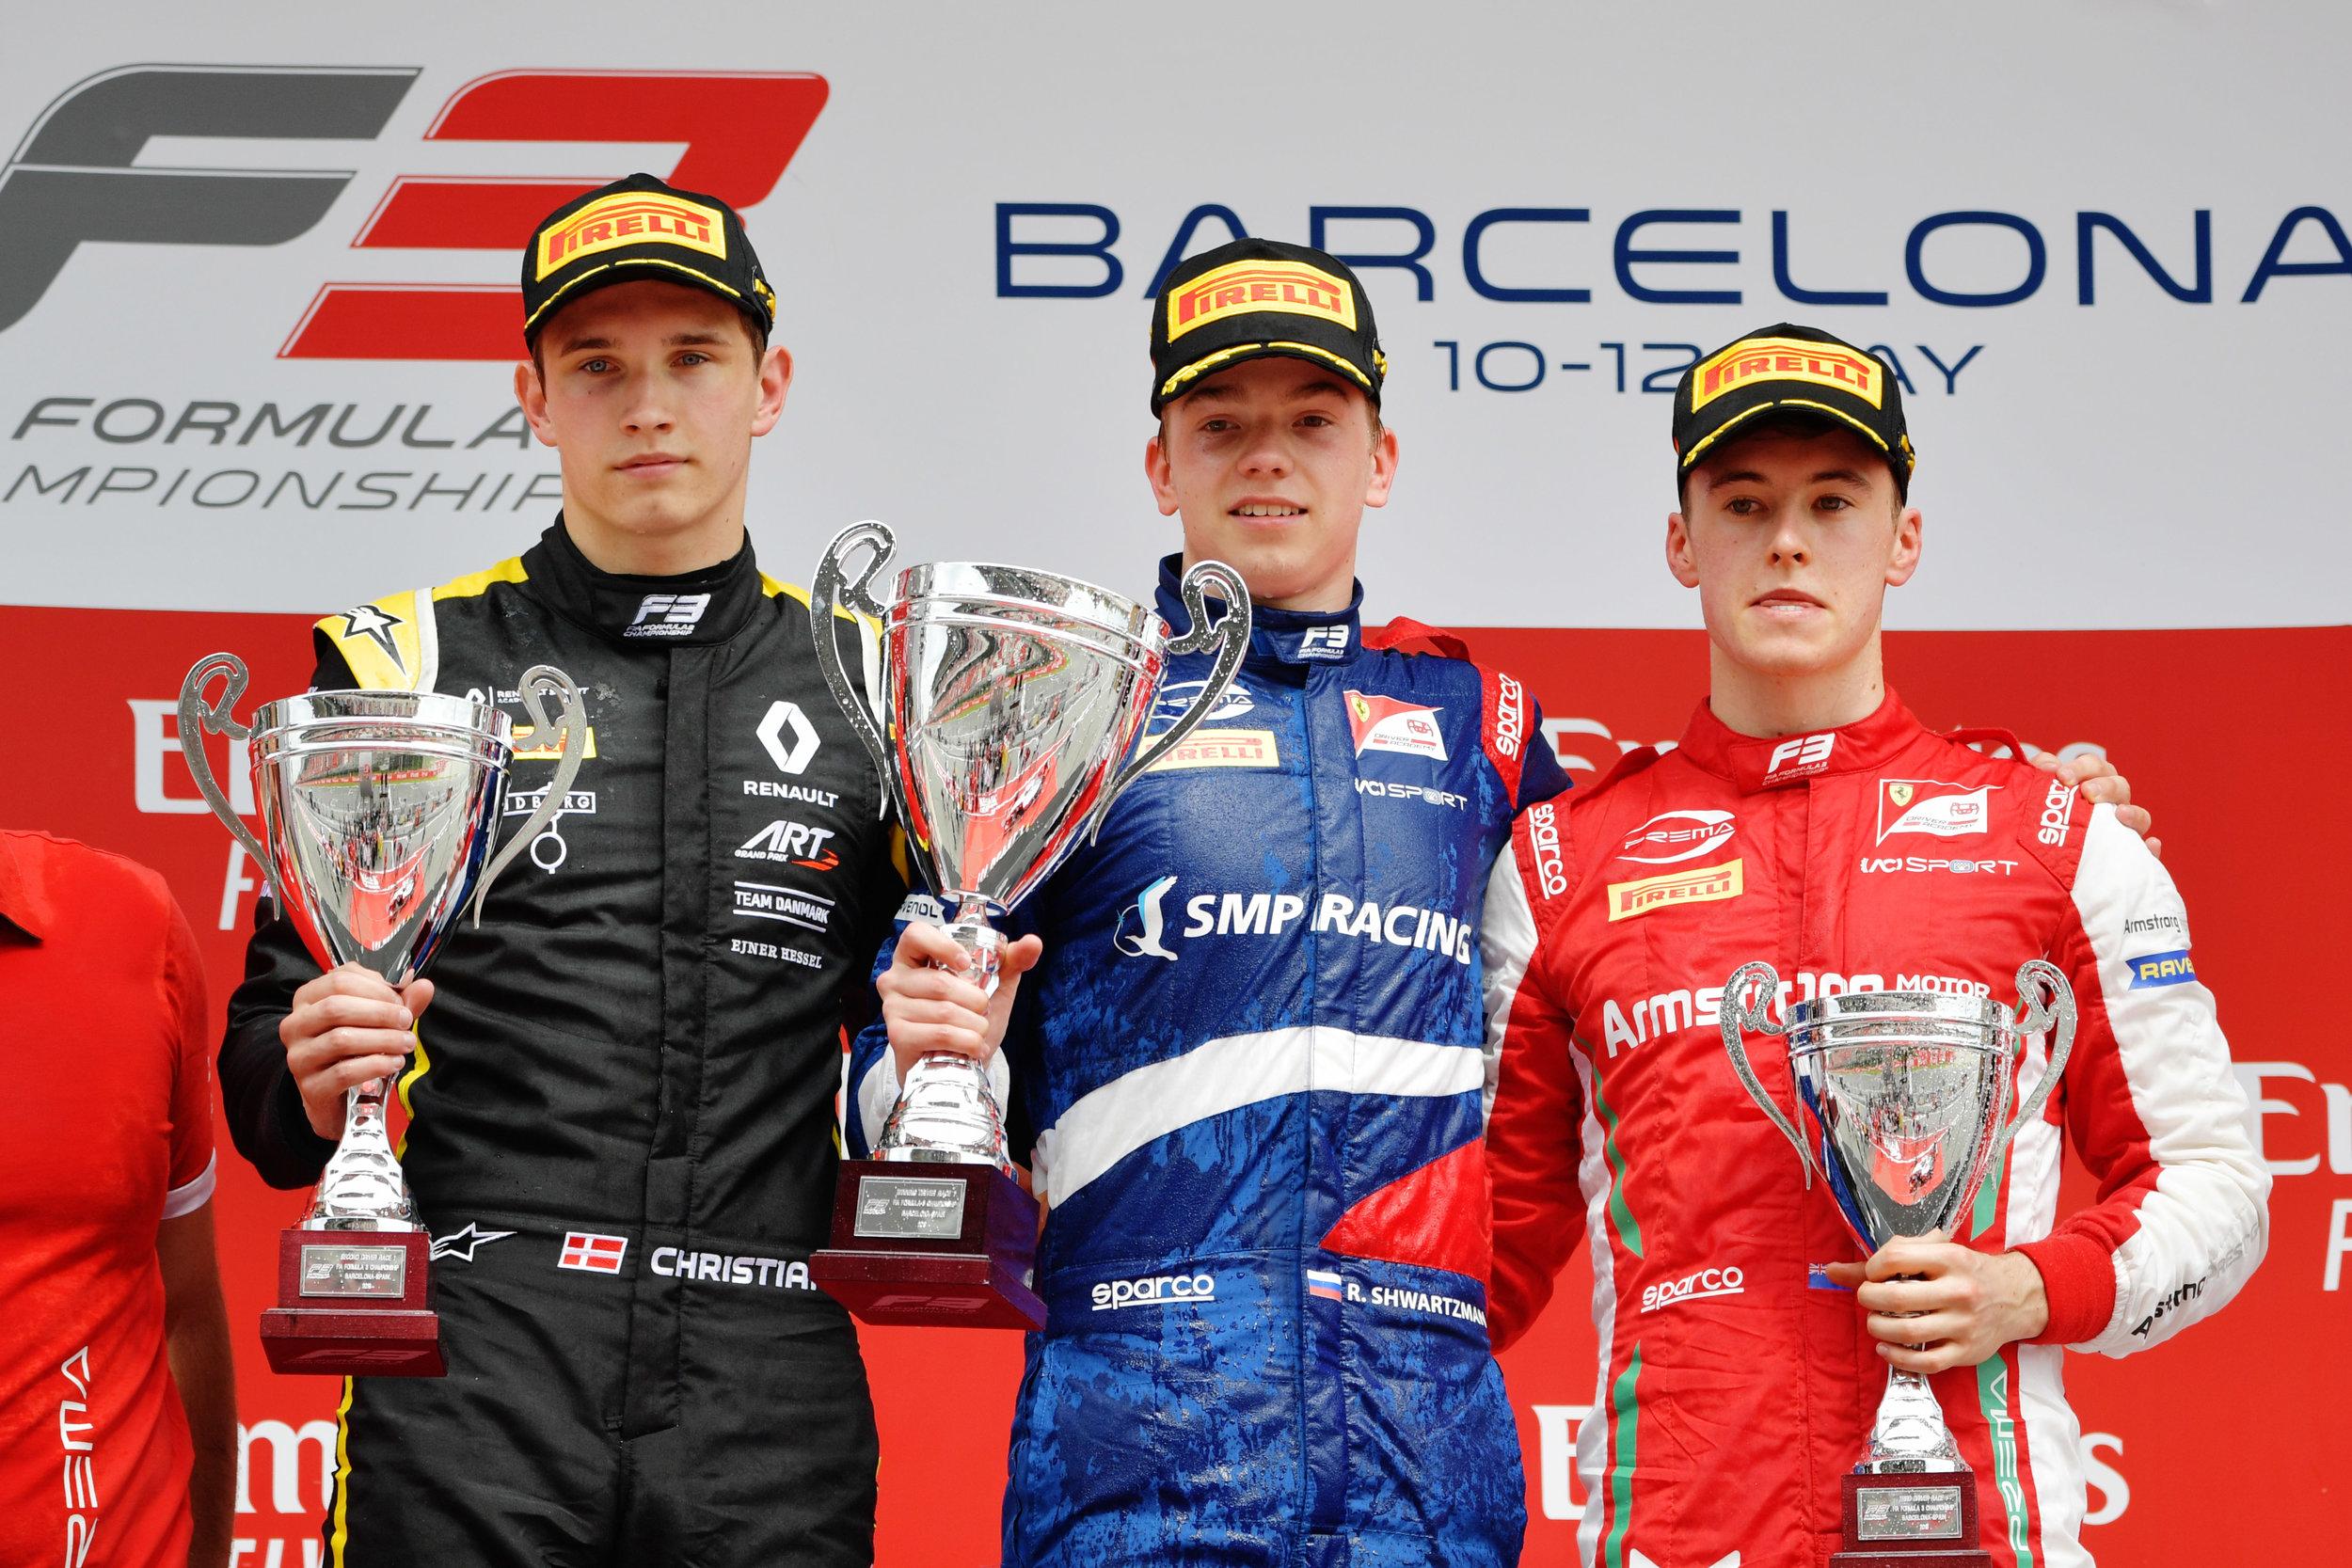 The maiden FIA Formula 3 podium, featuring a somber Lundgaard